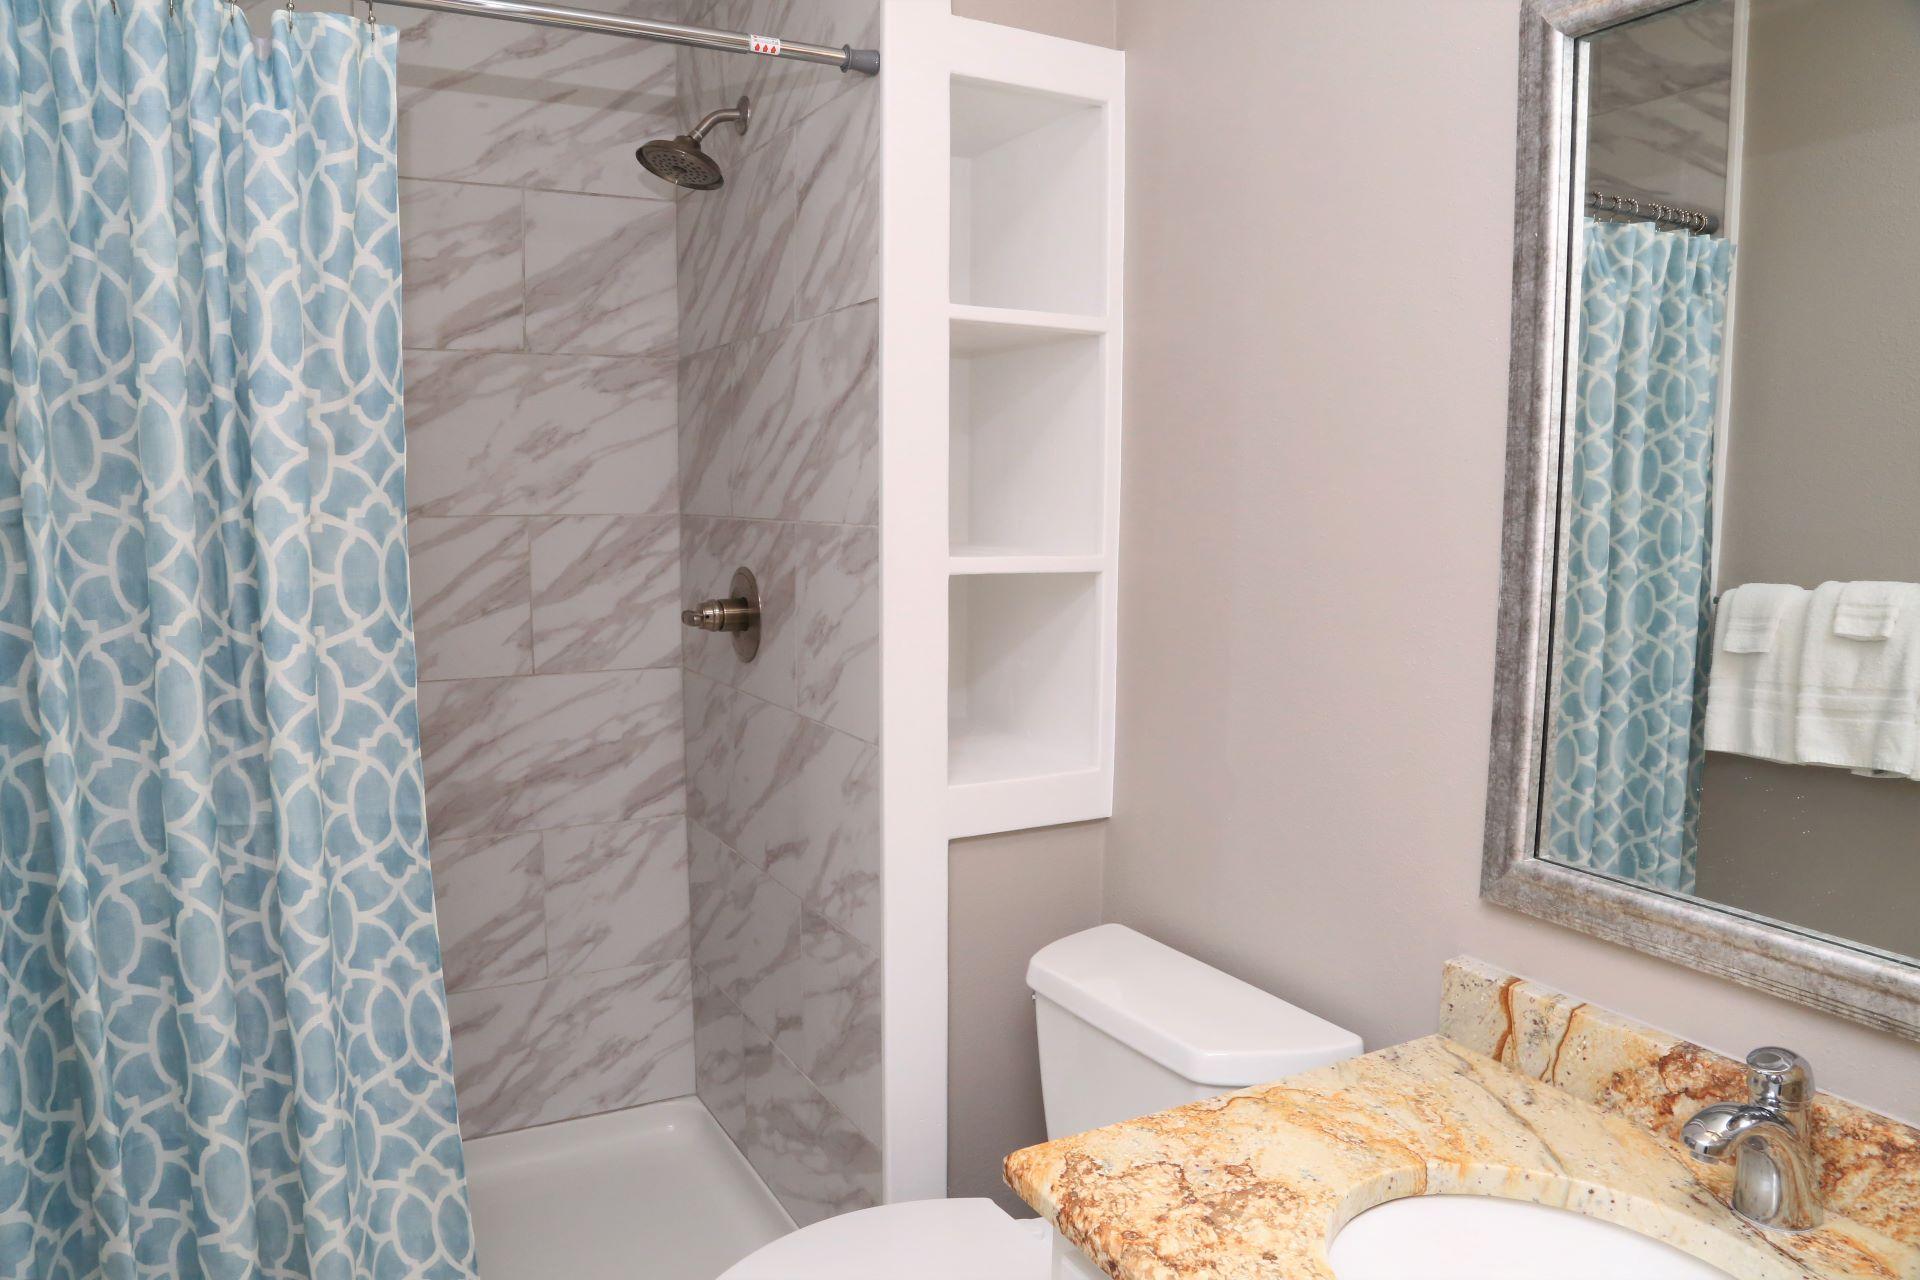 Great built-in shelving for storage in the en-suite bathroom